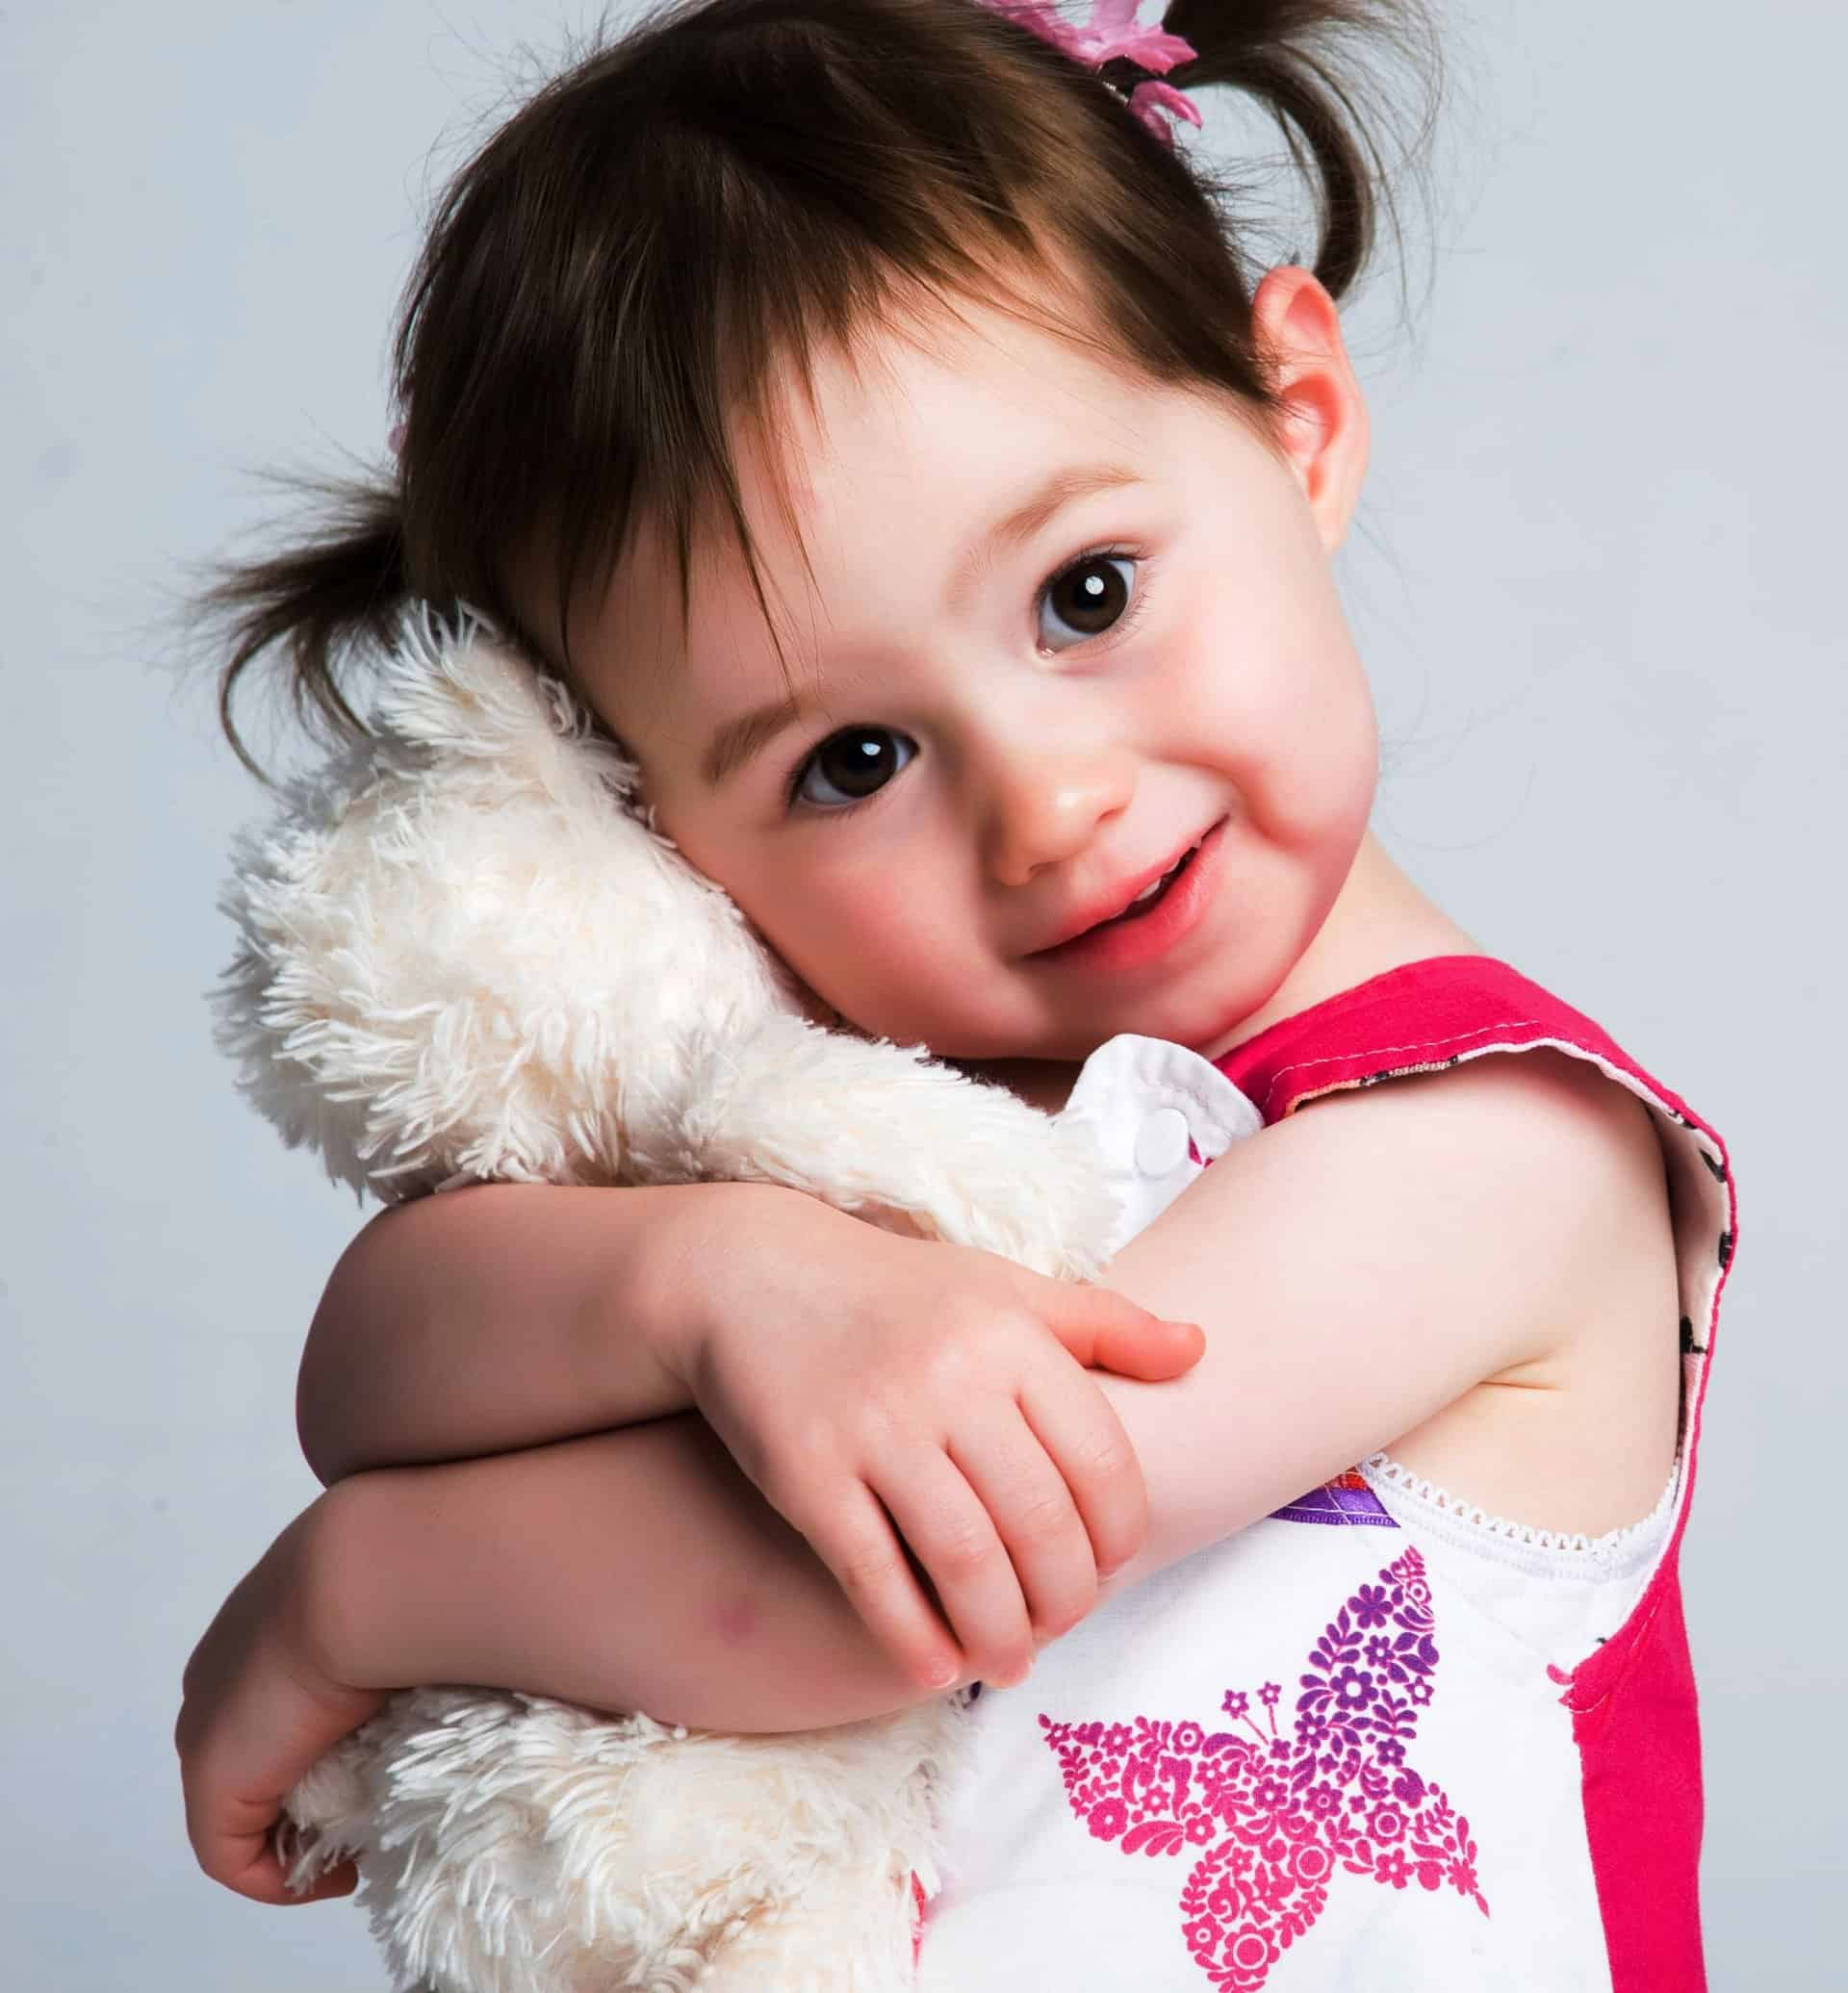 when to introduce security blanket, children treasure blankets, good parenting brighter children, security blankets, baby security blanket